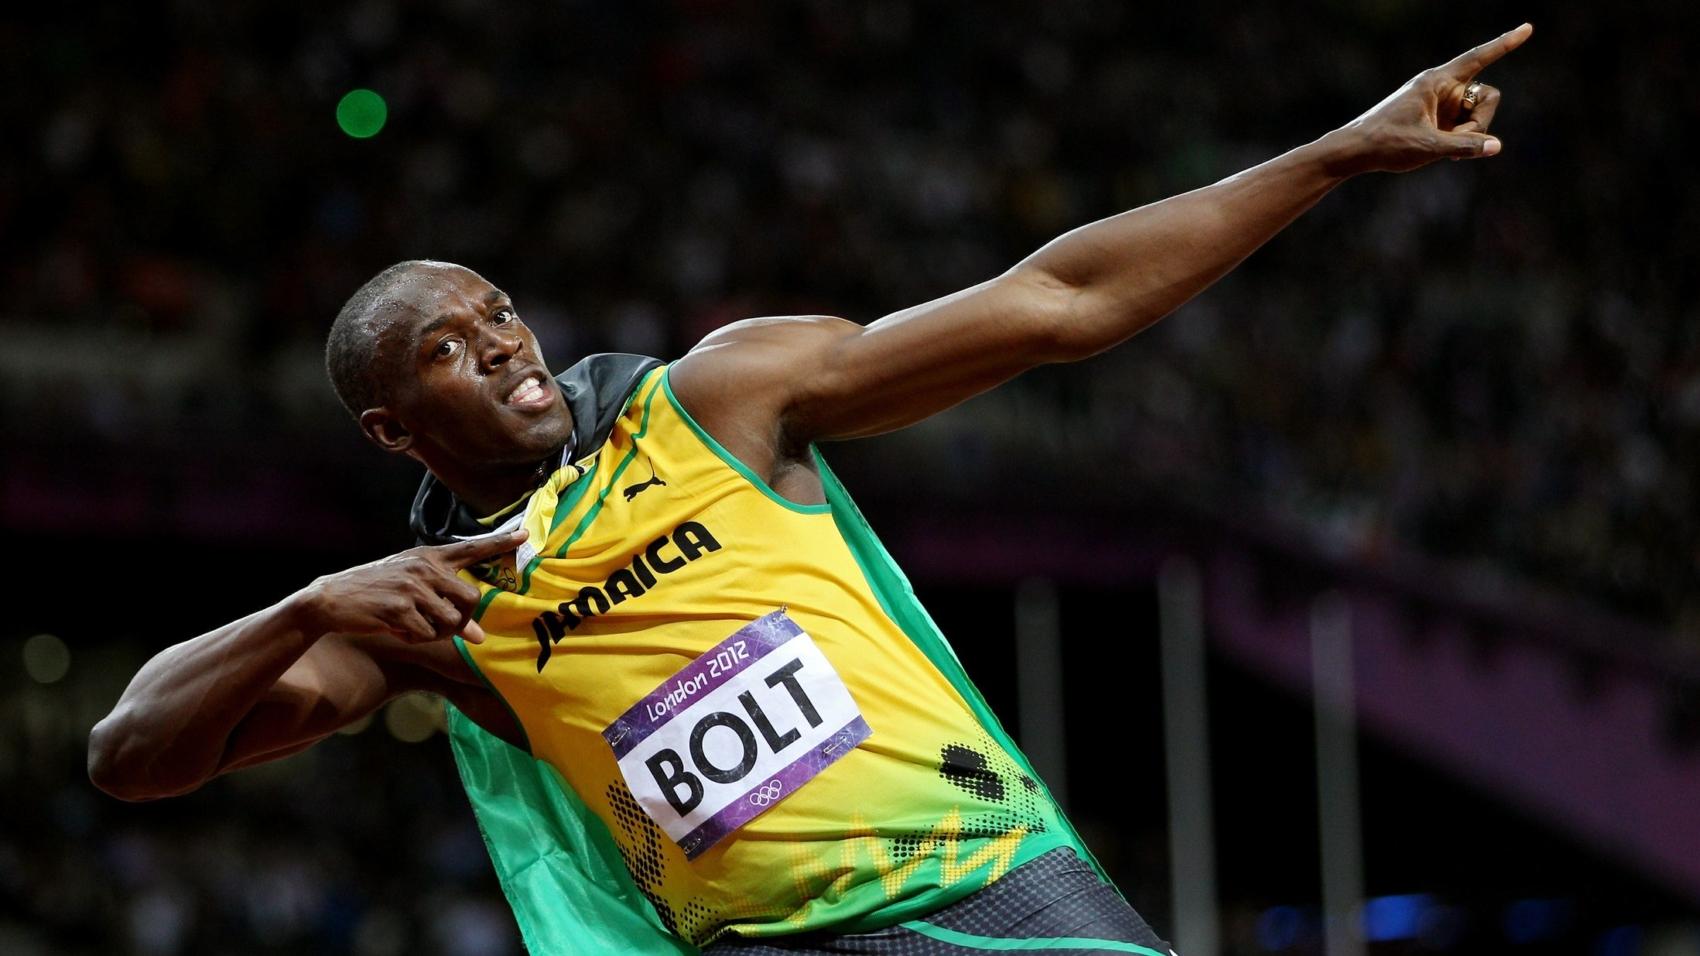 Usain-Bolt-Net-Worth